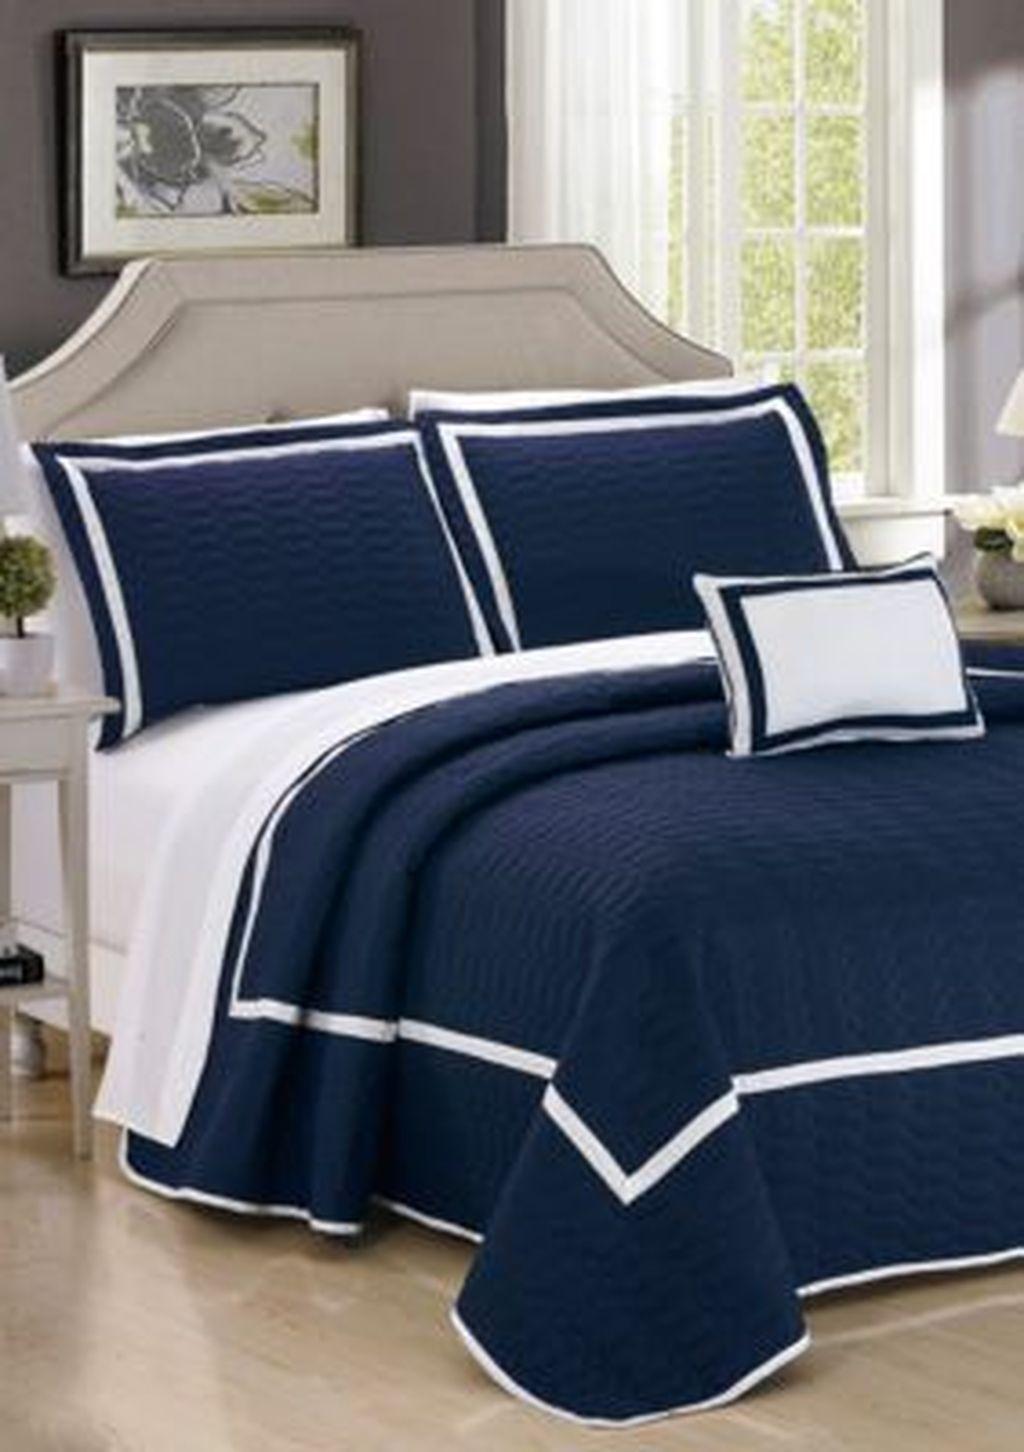 Inspiring Navy Blue Bedroom Decor Ideas You Should Copy 27